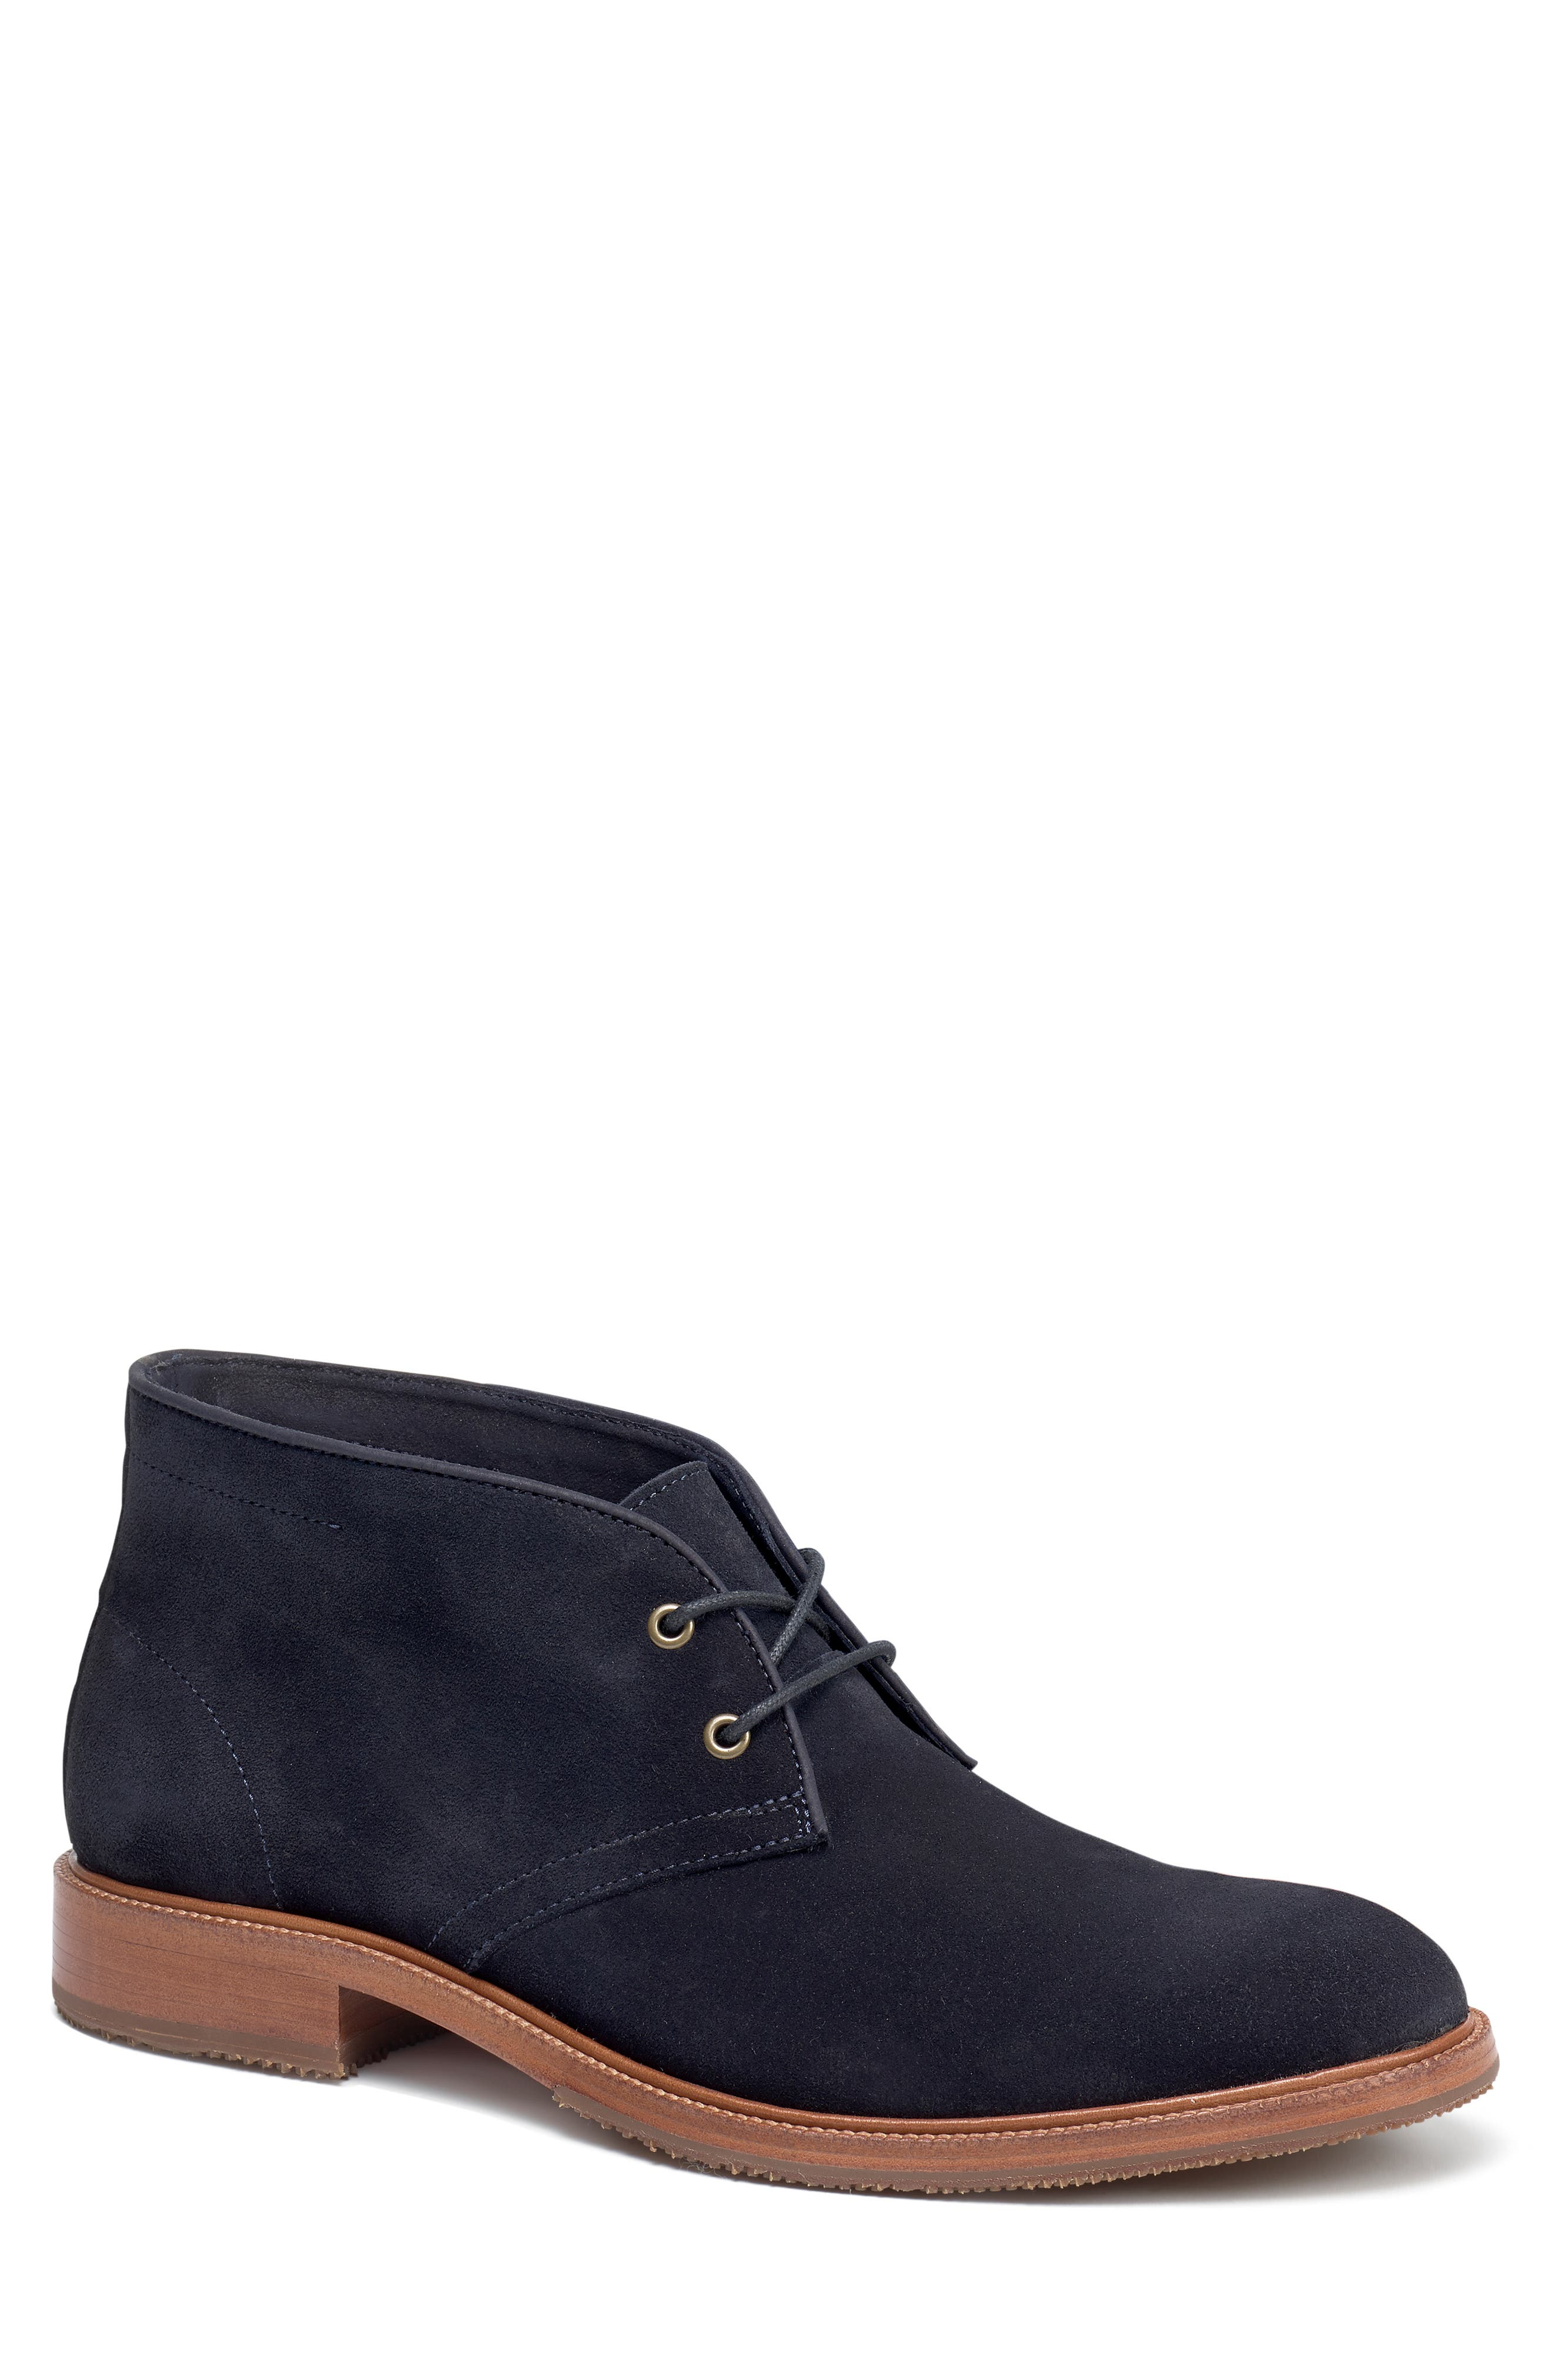 Trask Landers Chukka Boot, Blue